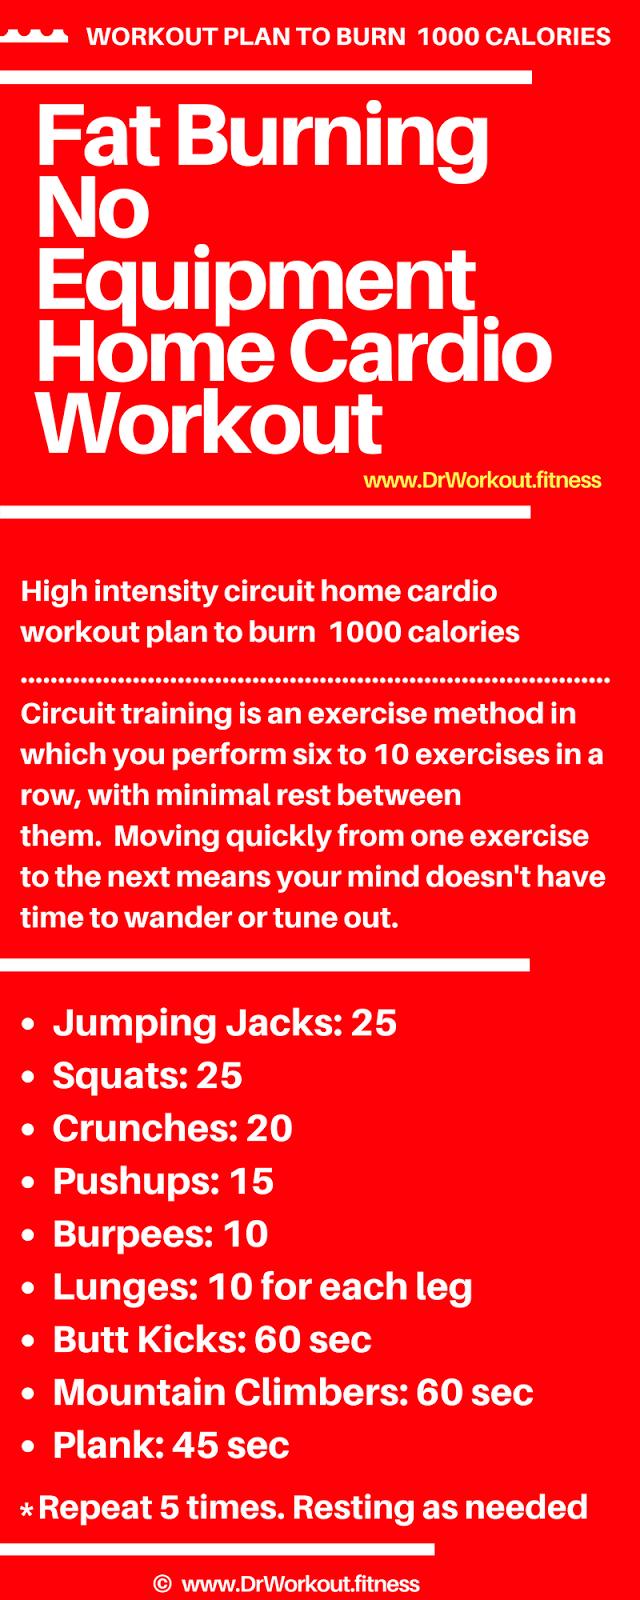 Fat Burning No Equipment Home Cardio Workout DrWorkoutfitness – Home Workout Plan No Equipment